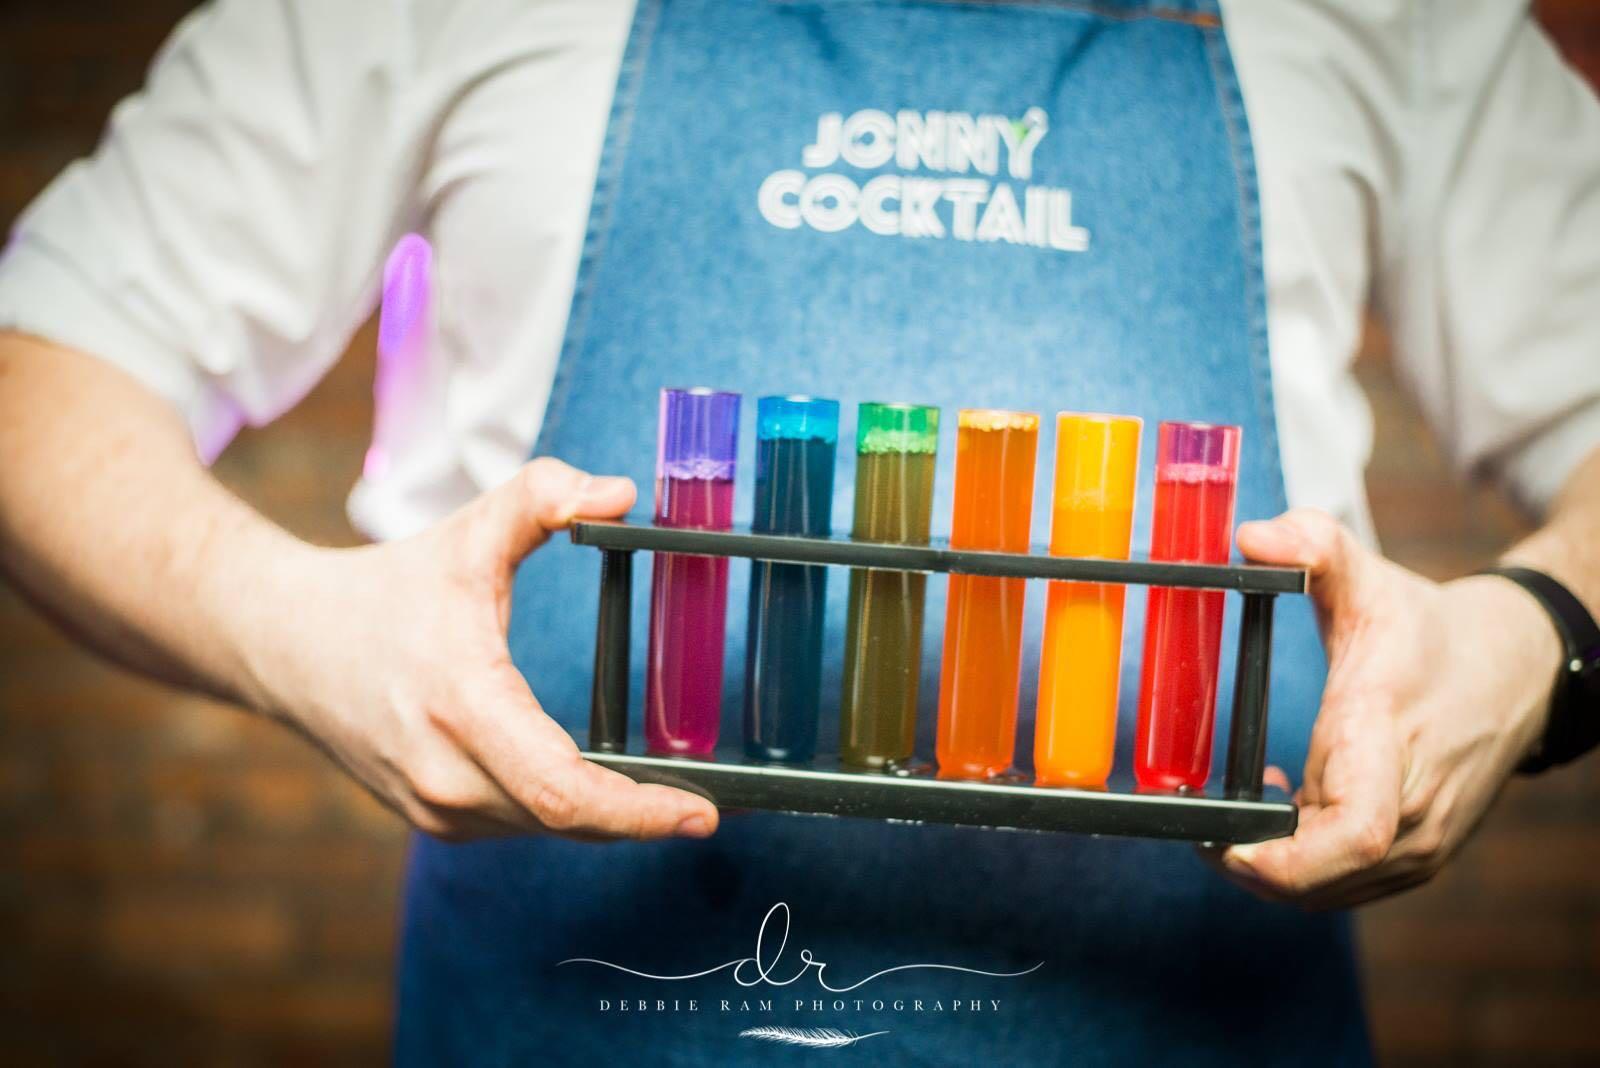 Jonny Cocktail Simcha's Services